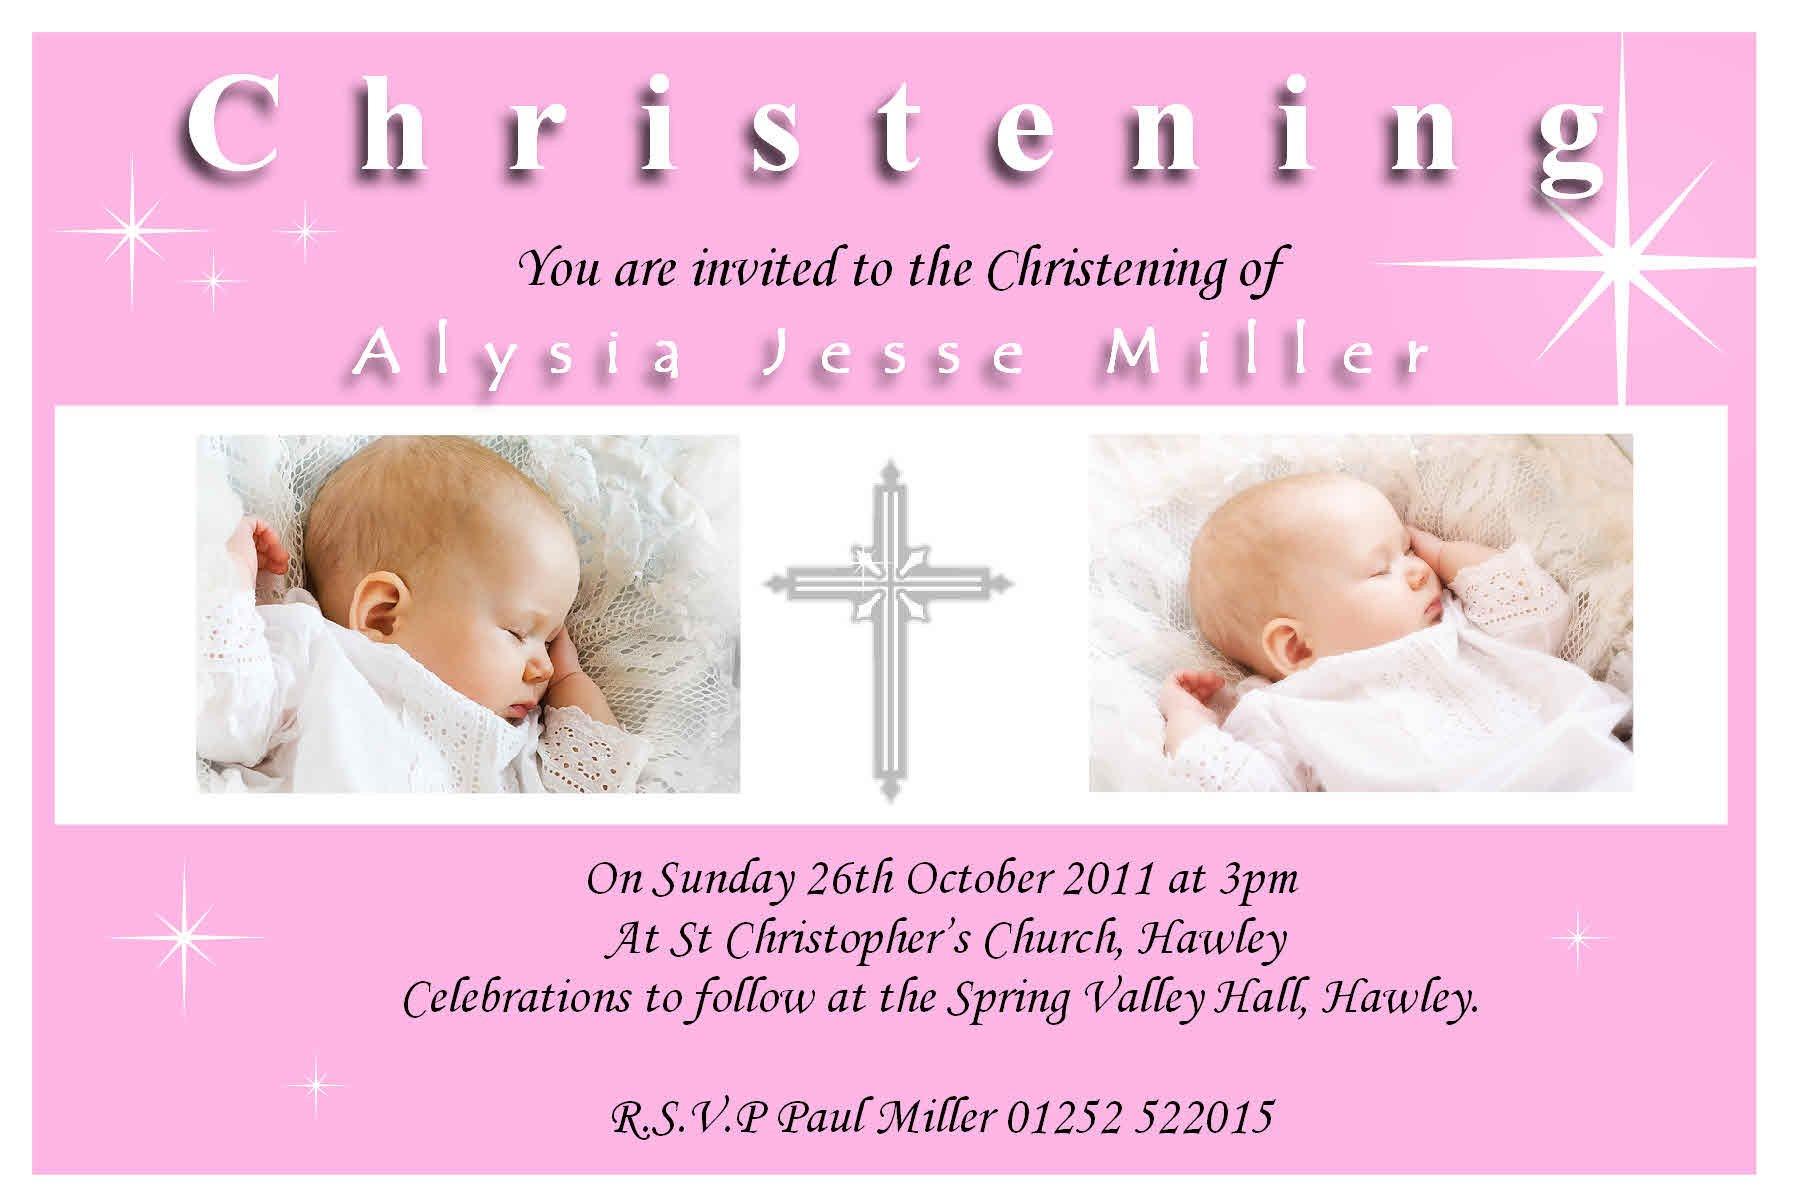 blank invitation templates for baptism blank invitation templates for christening 1800 x 1200